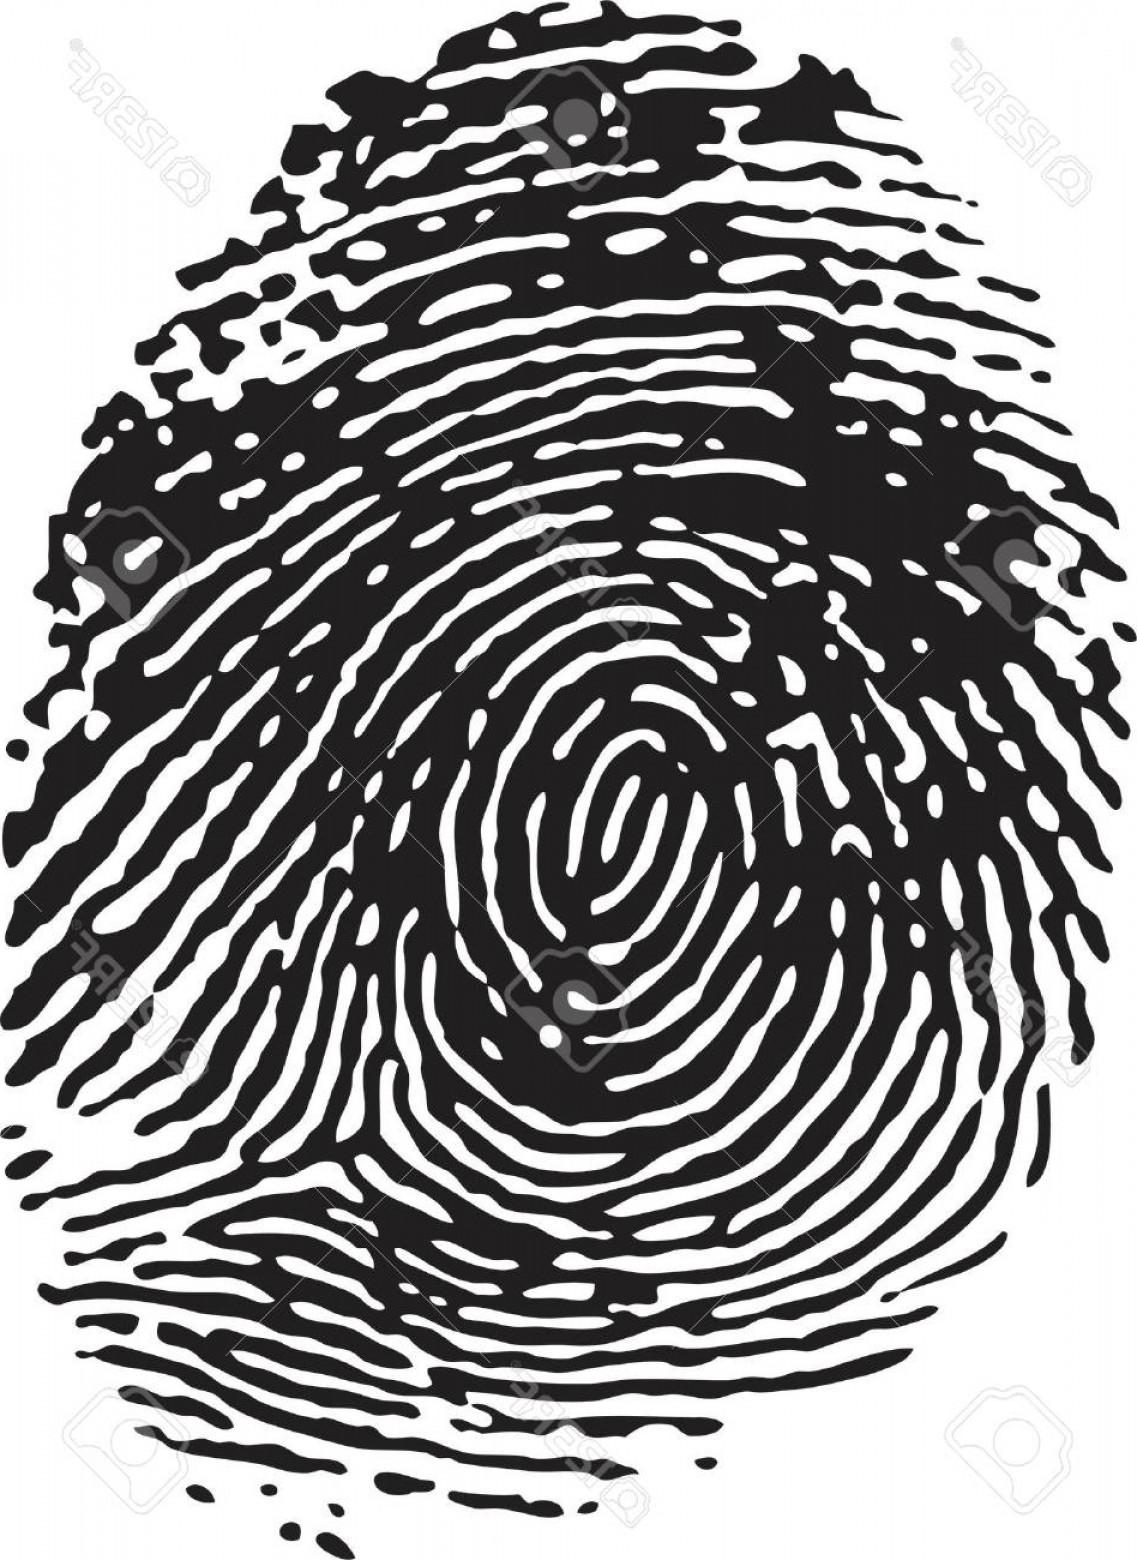 1137x1560 Black And White Thumbprint